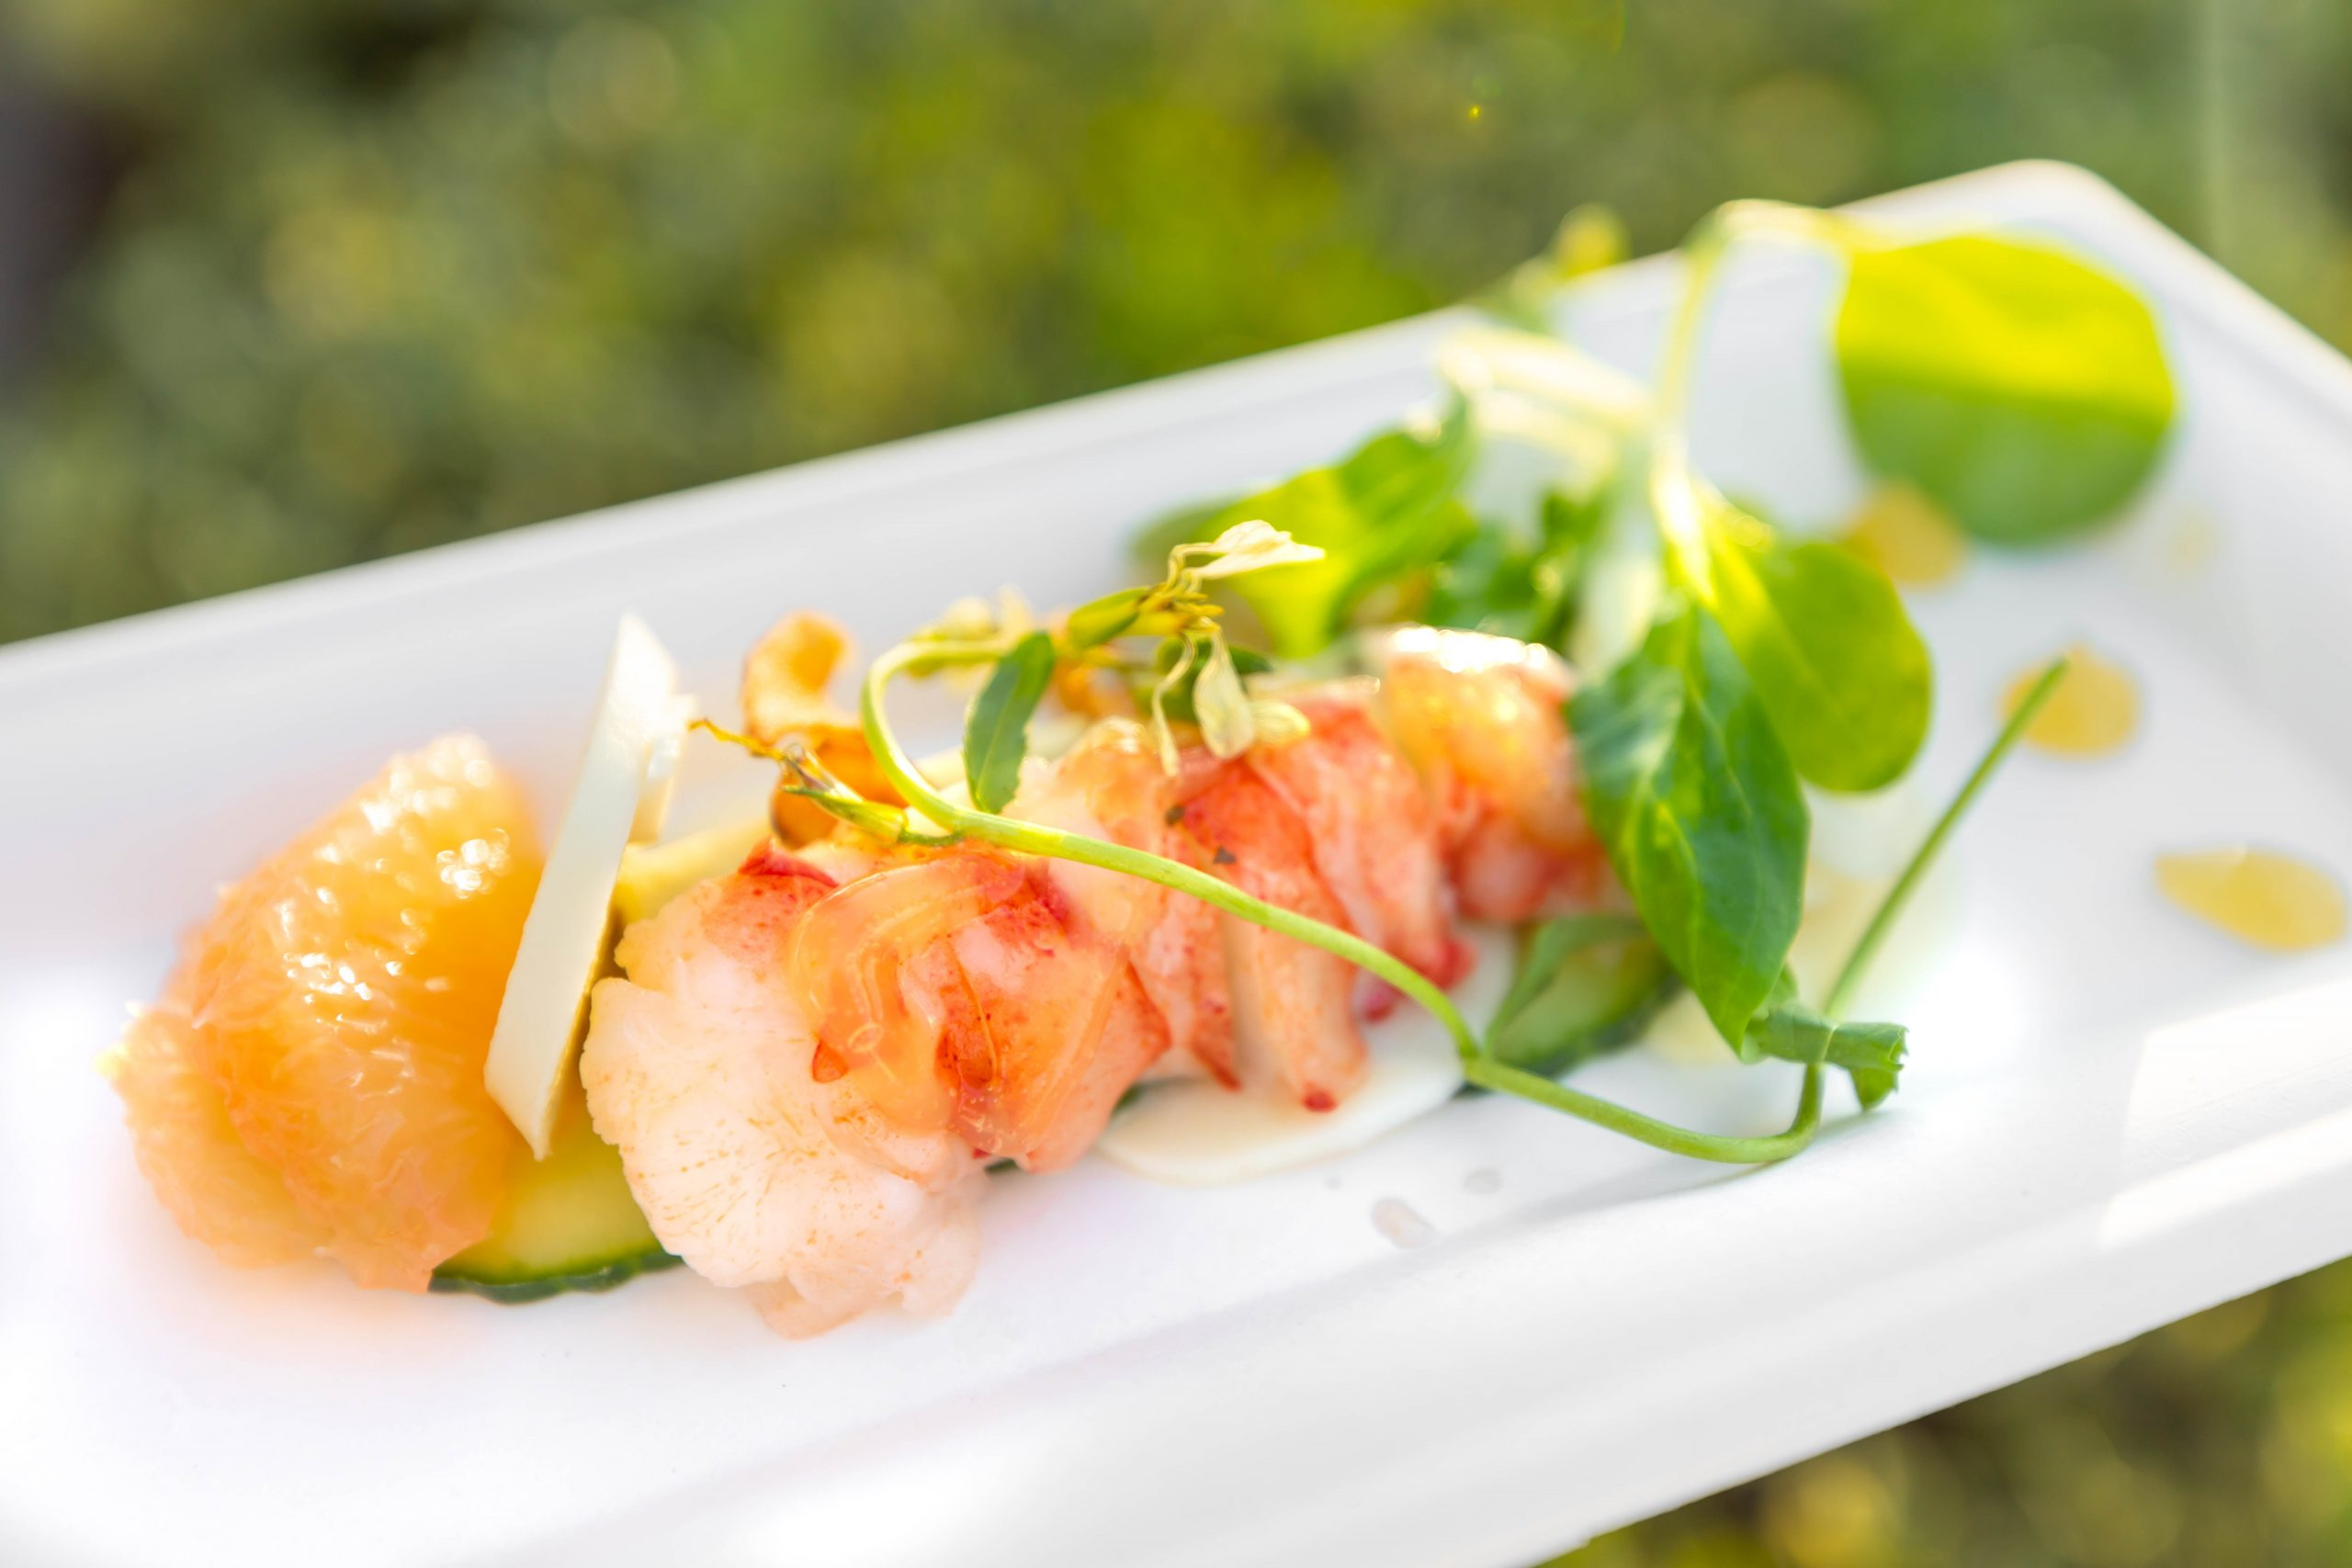 Meyer Lemon-poached Lobster Salad with Grapefruit-Rosé vinaigrette, yuzu-marinated hearts of palm, and avocado-yuzu panna cotta at Epcot Walt Disney World by Annie Fairfax